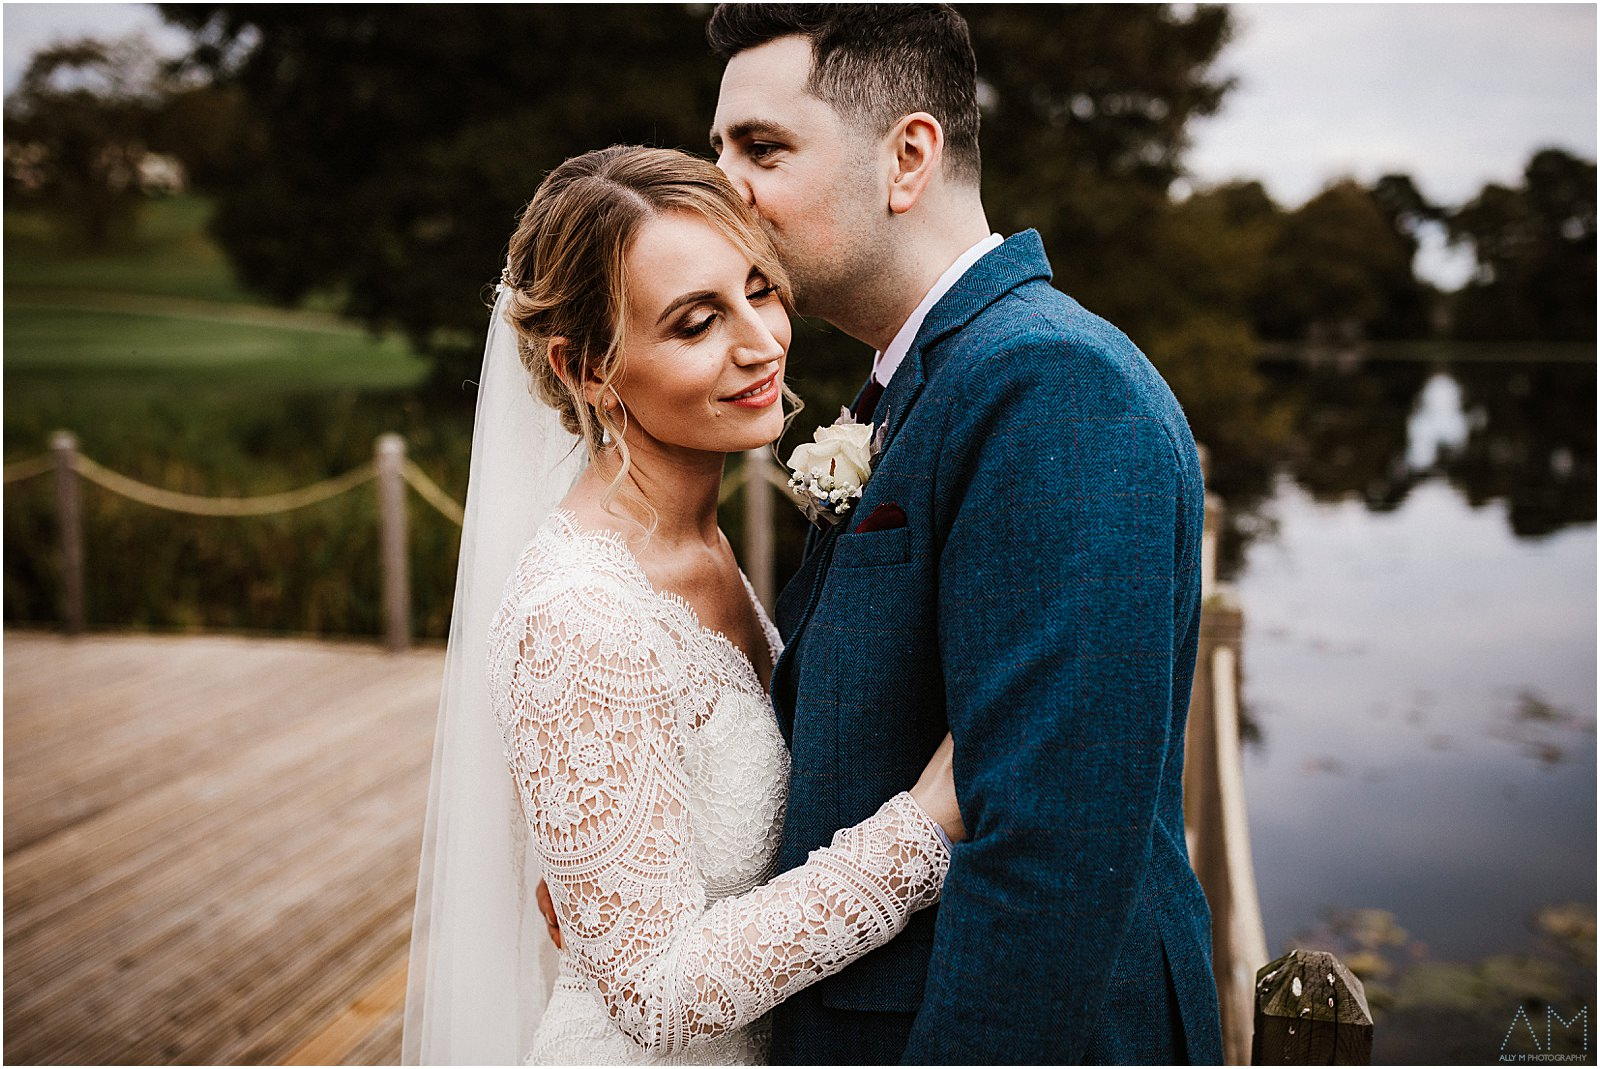 Delamere Manor bride and groom